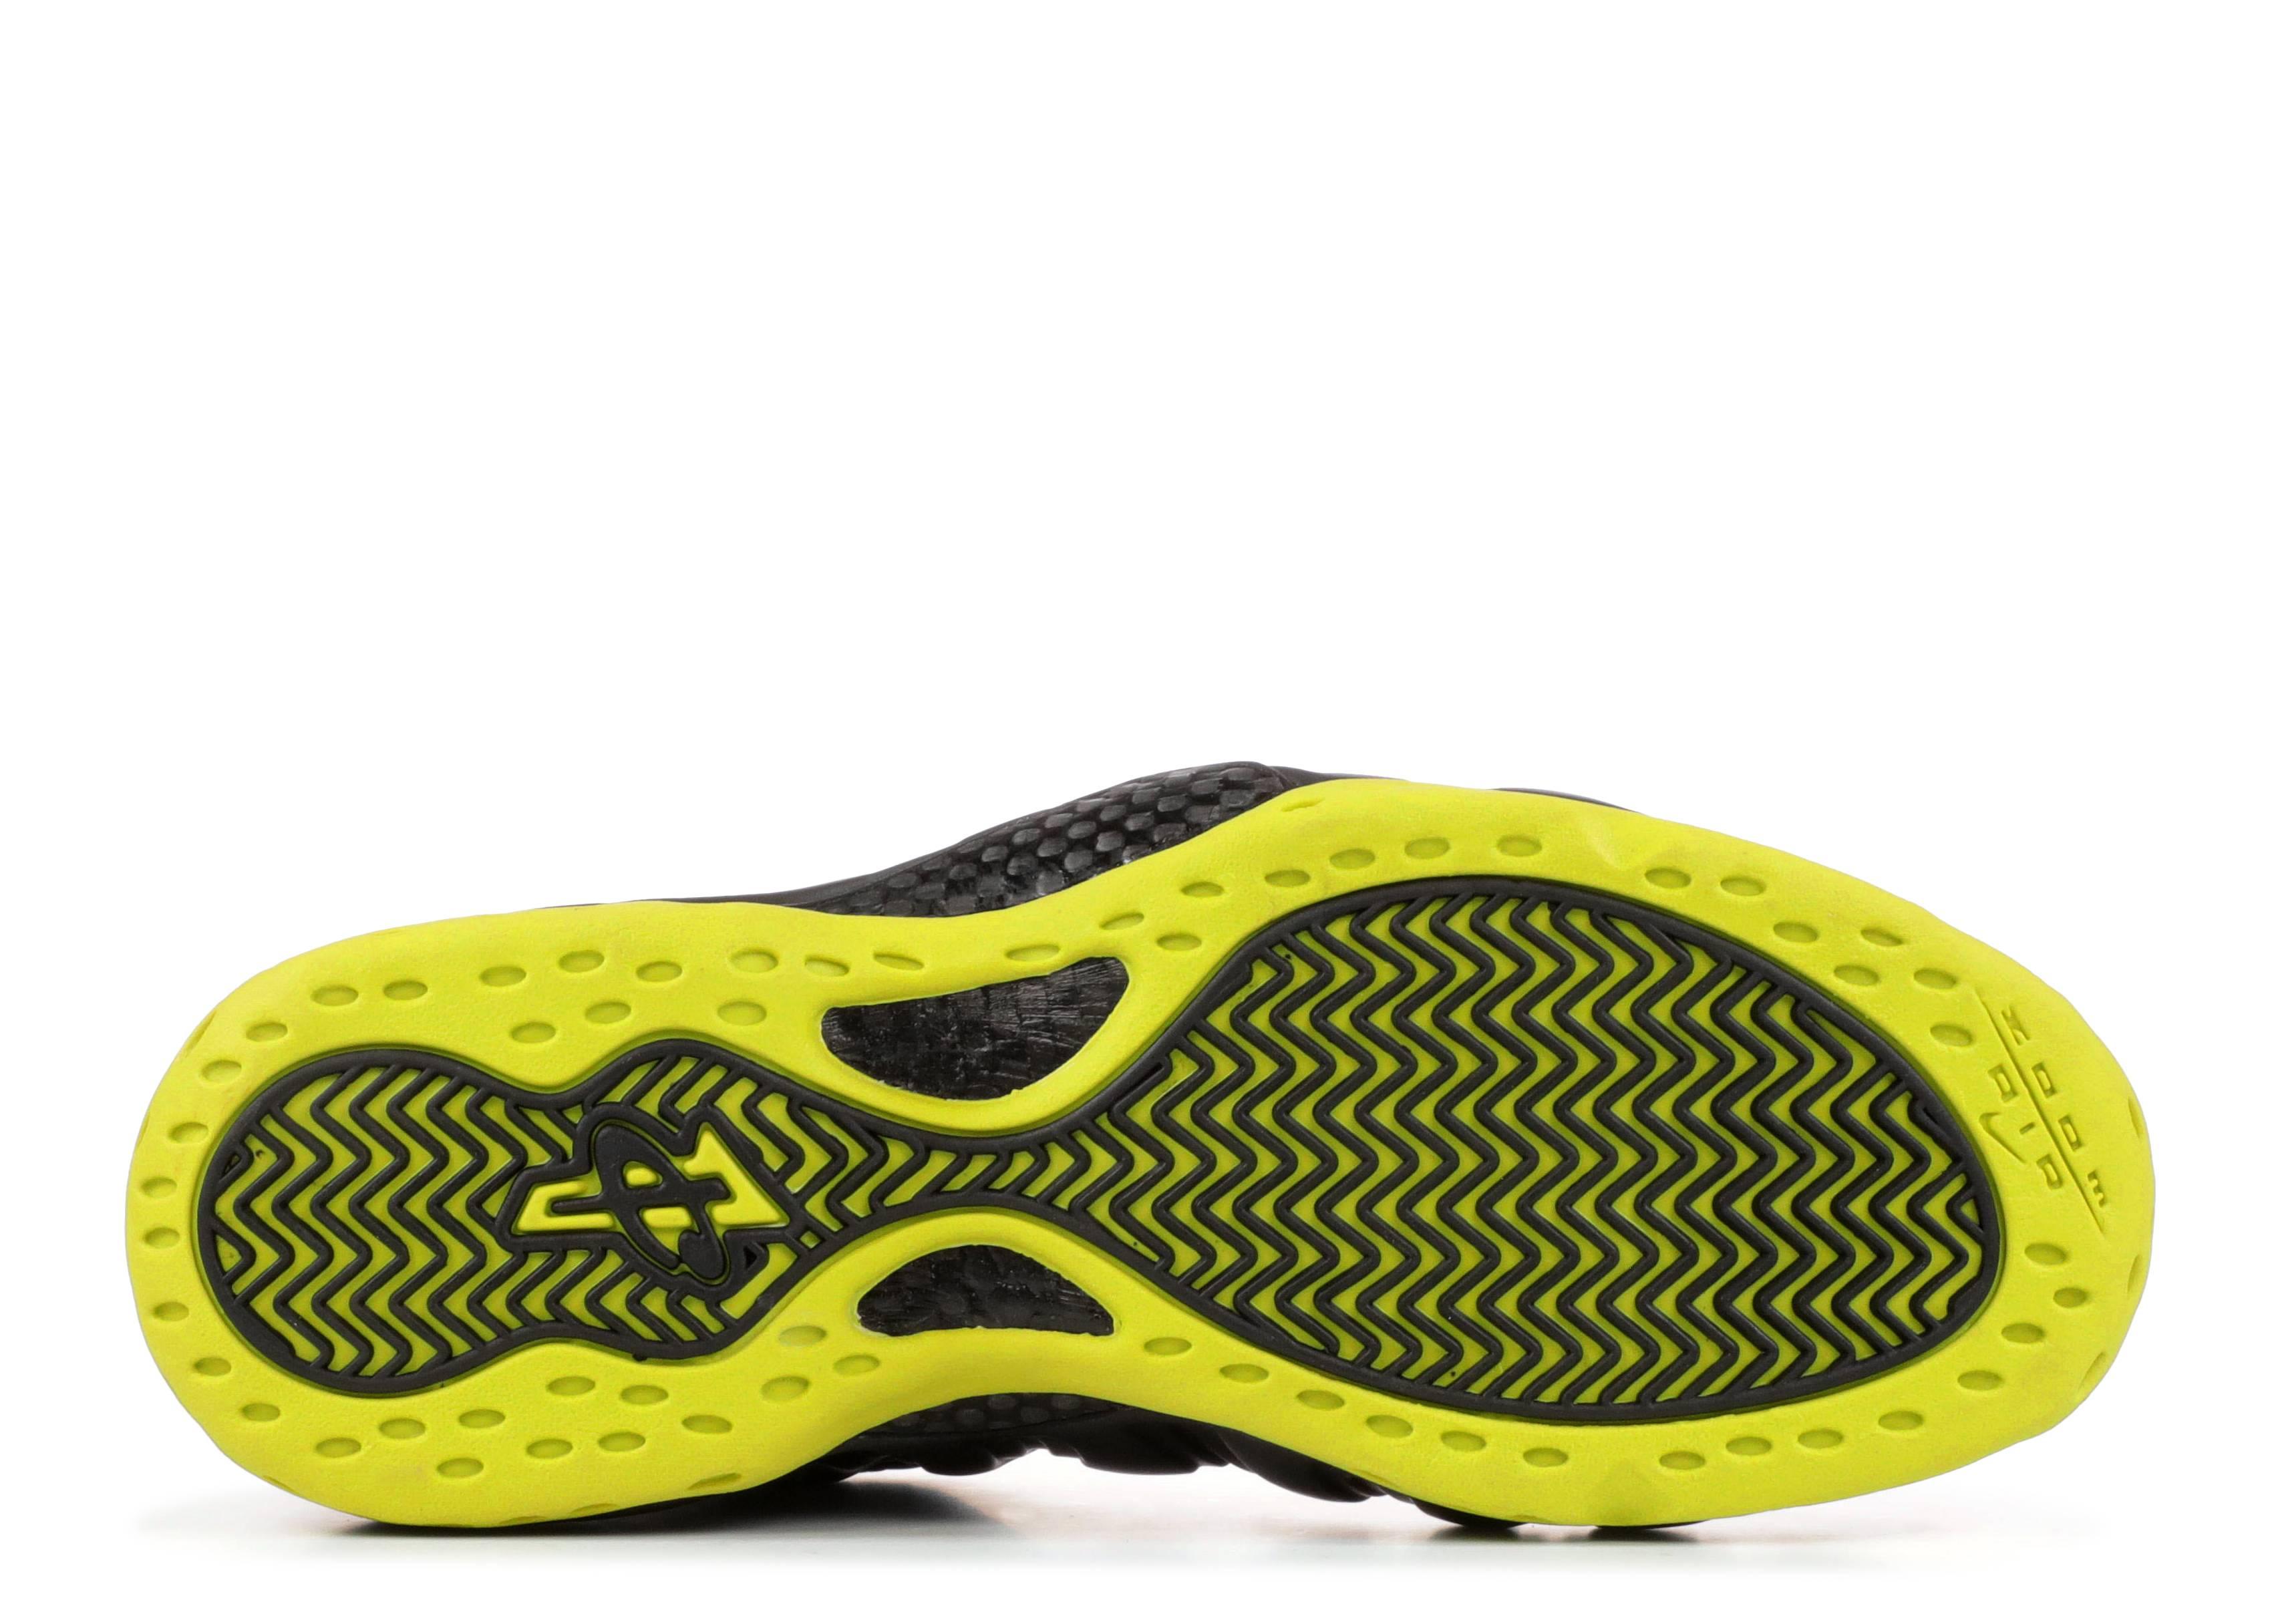 Nike Air Foamposite One University Blue UNC 314996402 ...